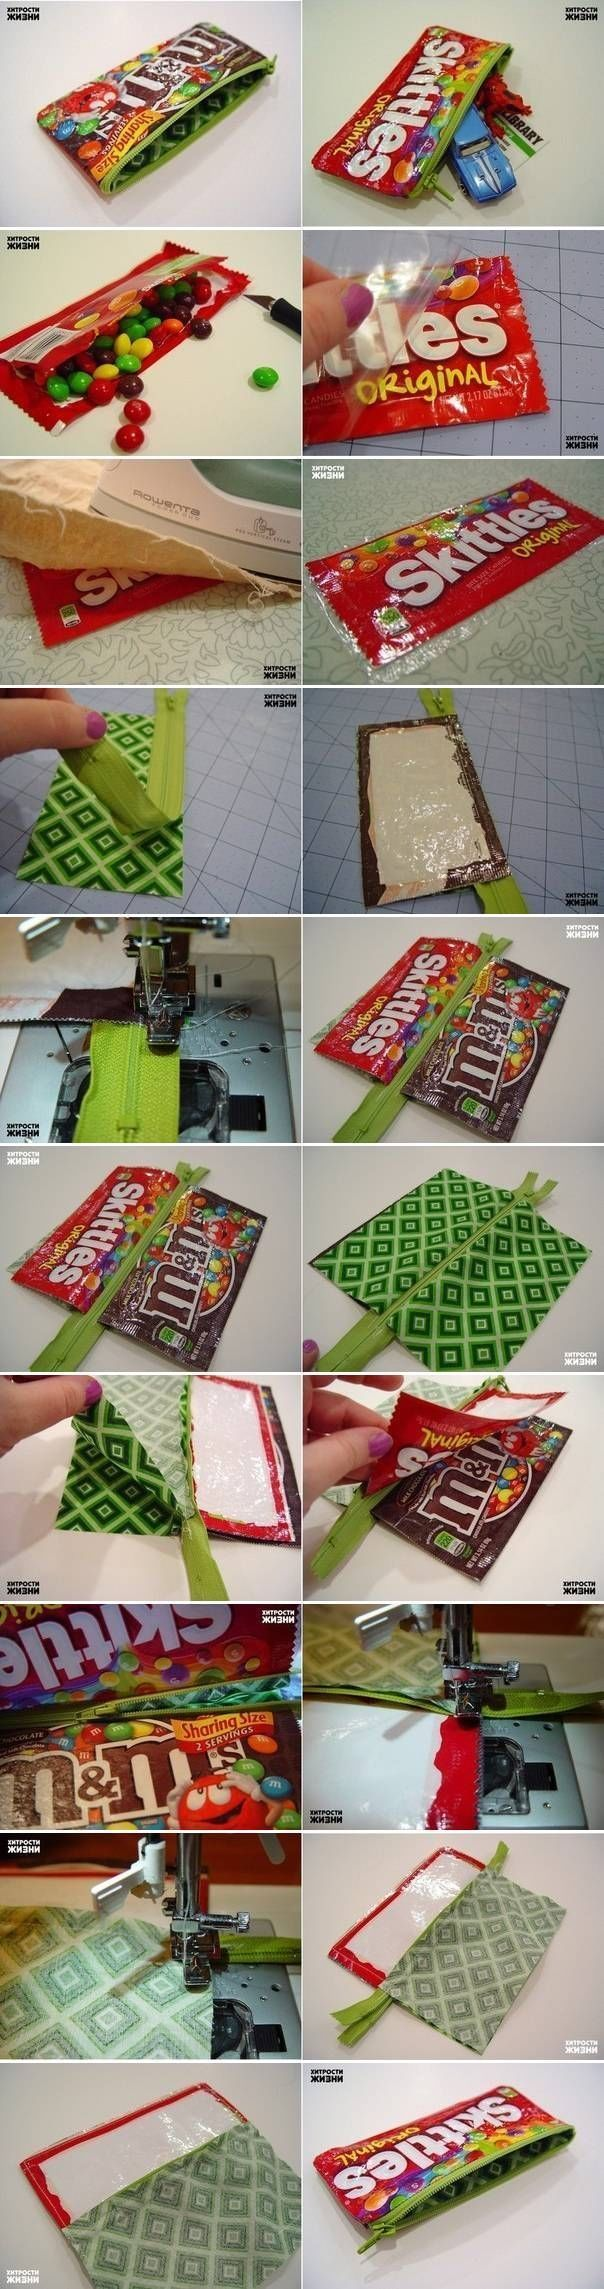 DIY Skittles Case diy craft crafts reuse how to tutorial repurpose teen crafts crafts for teens